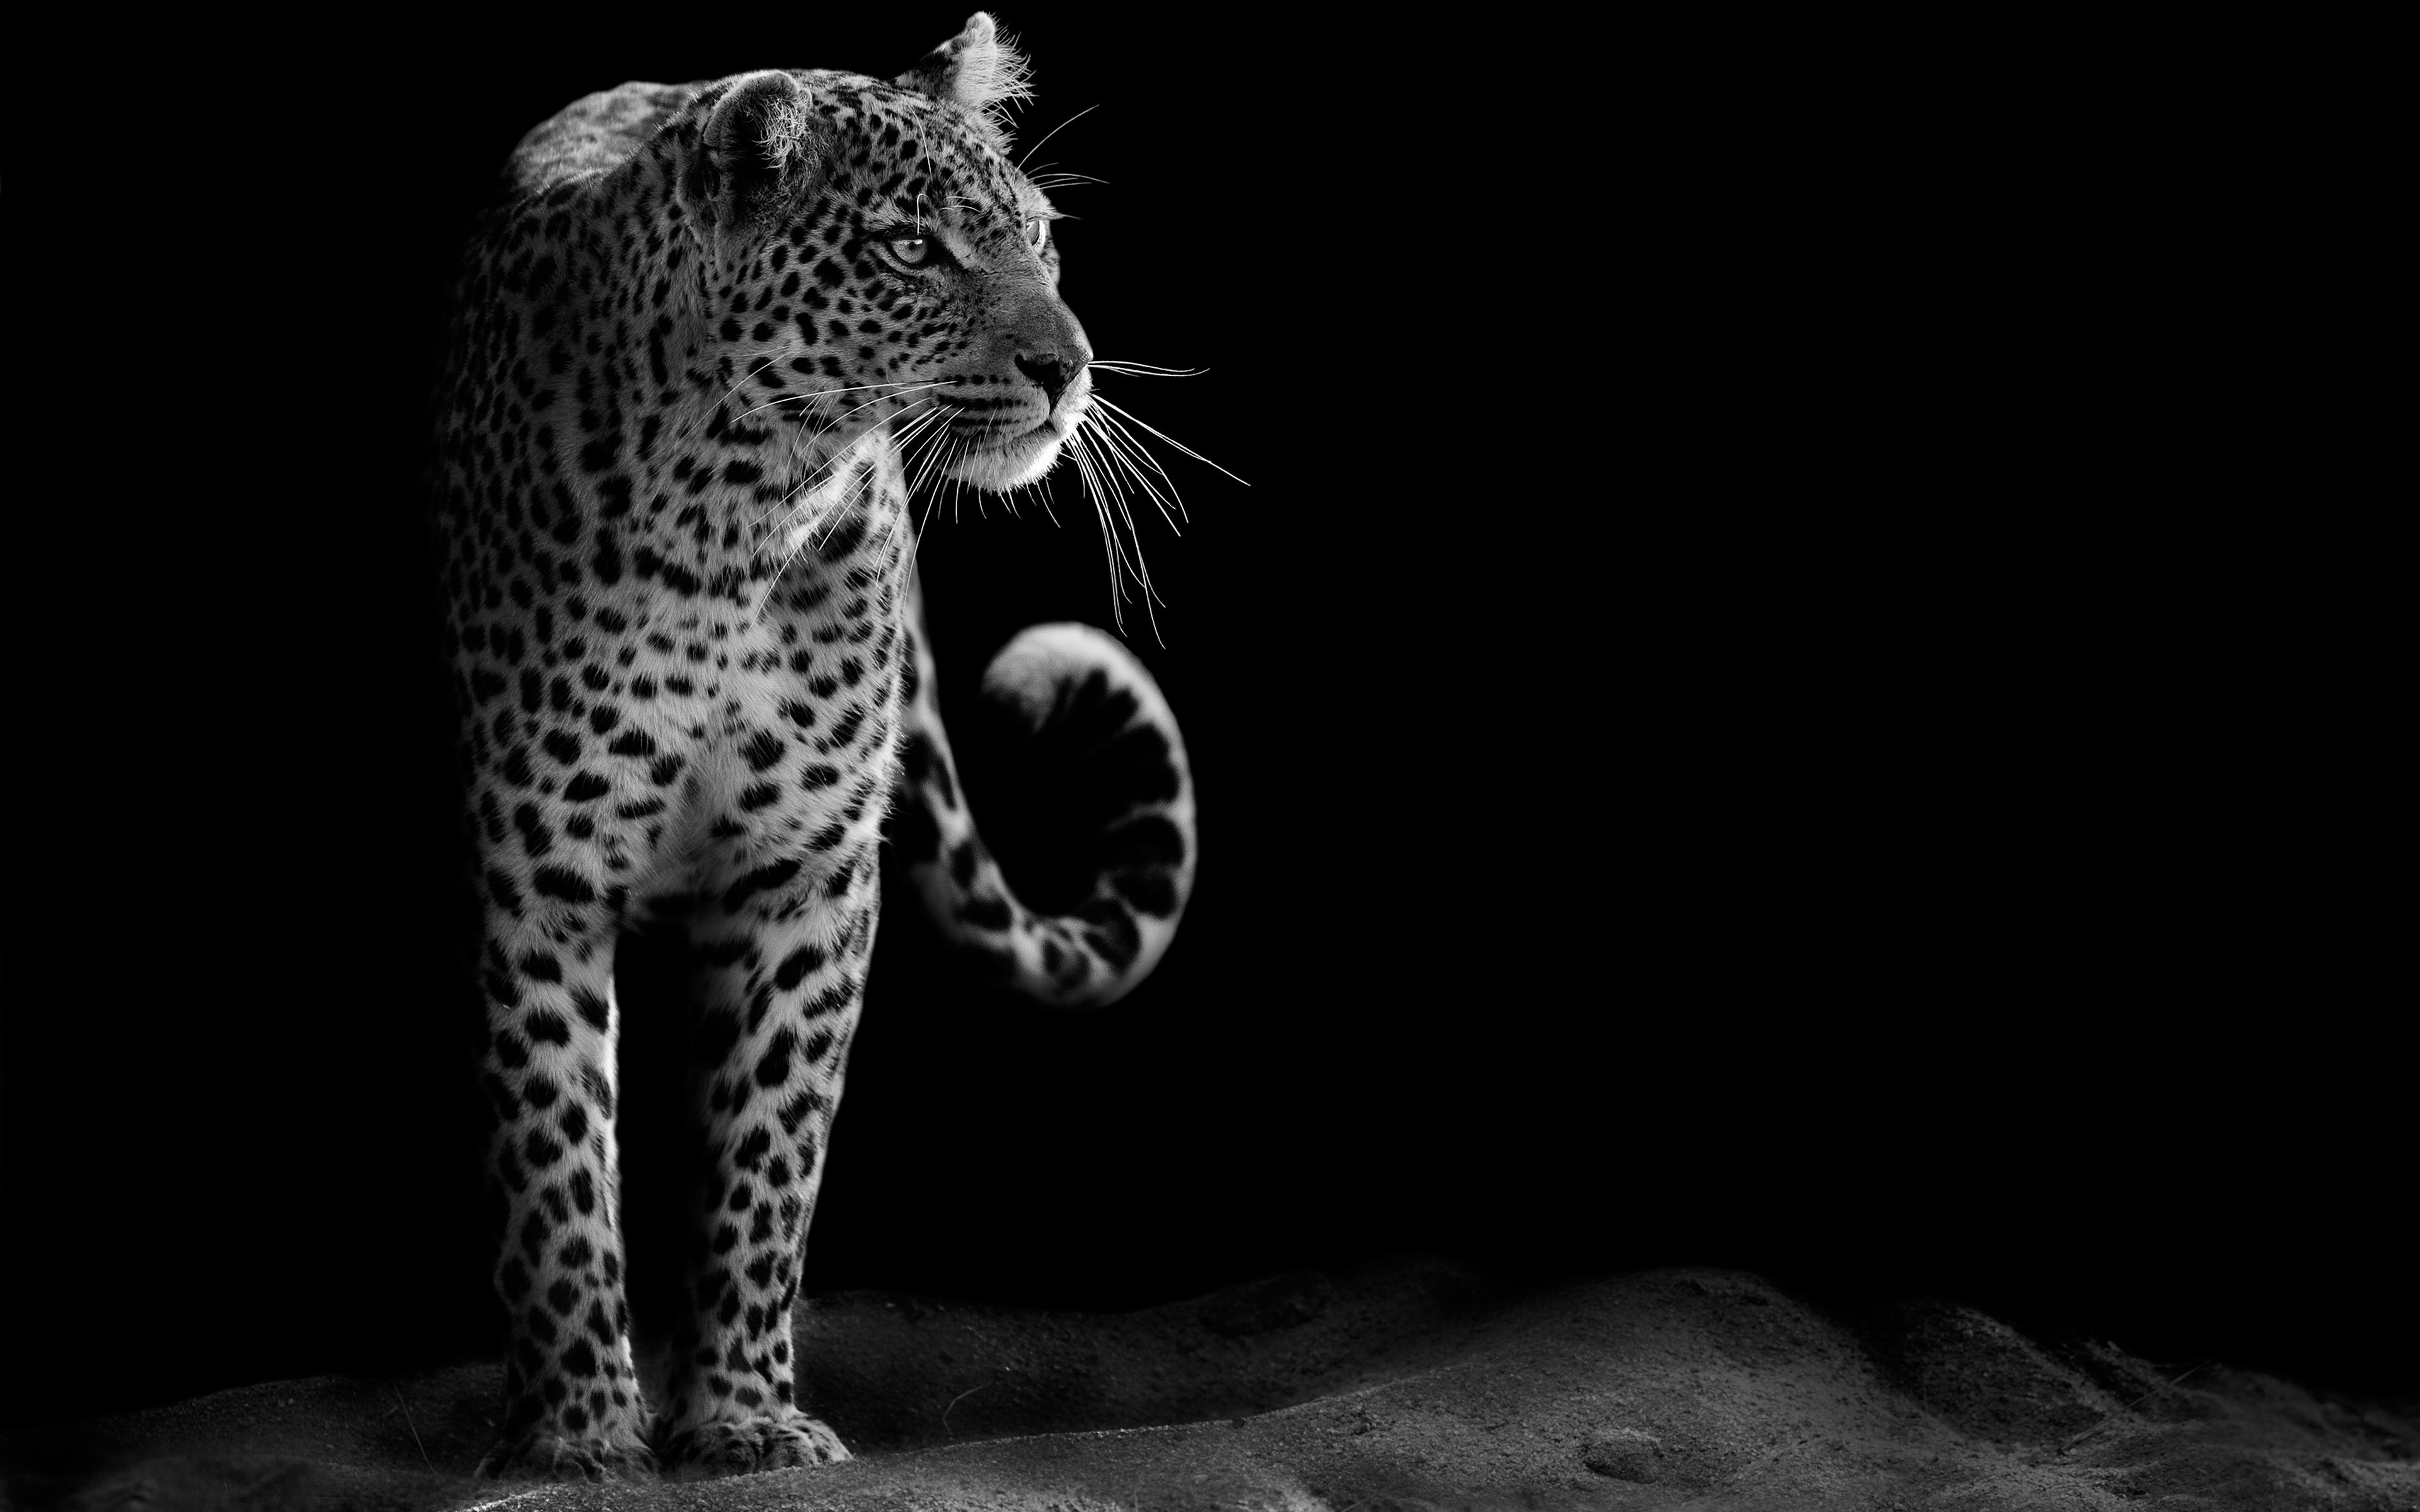 1920x1080 Black Leopard Wallpaper